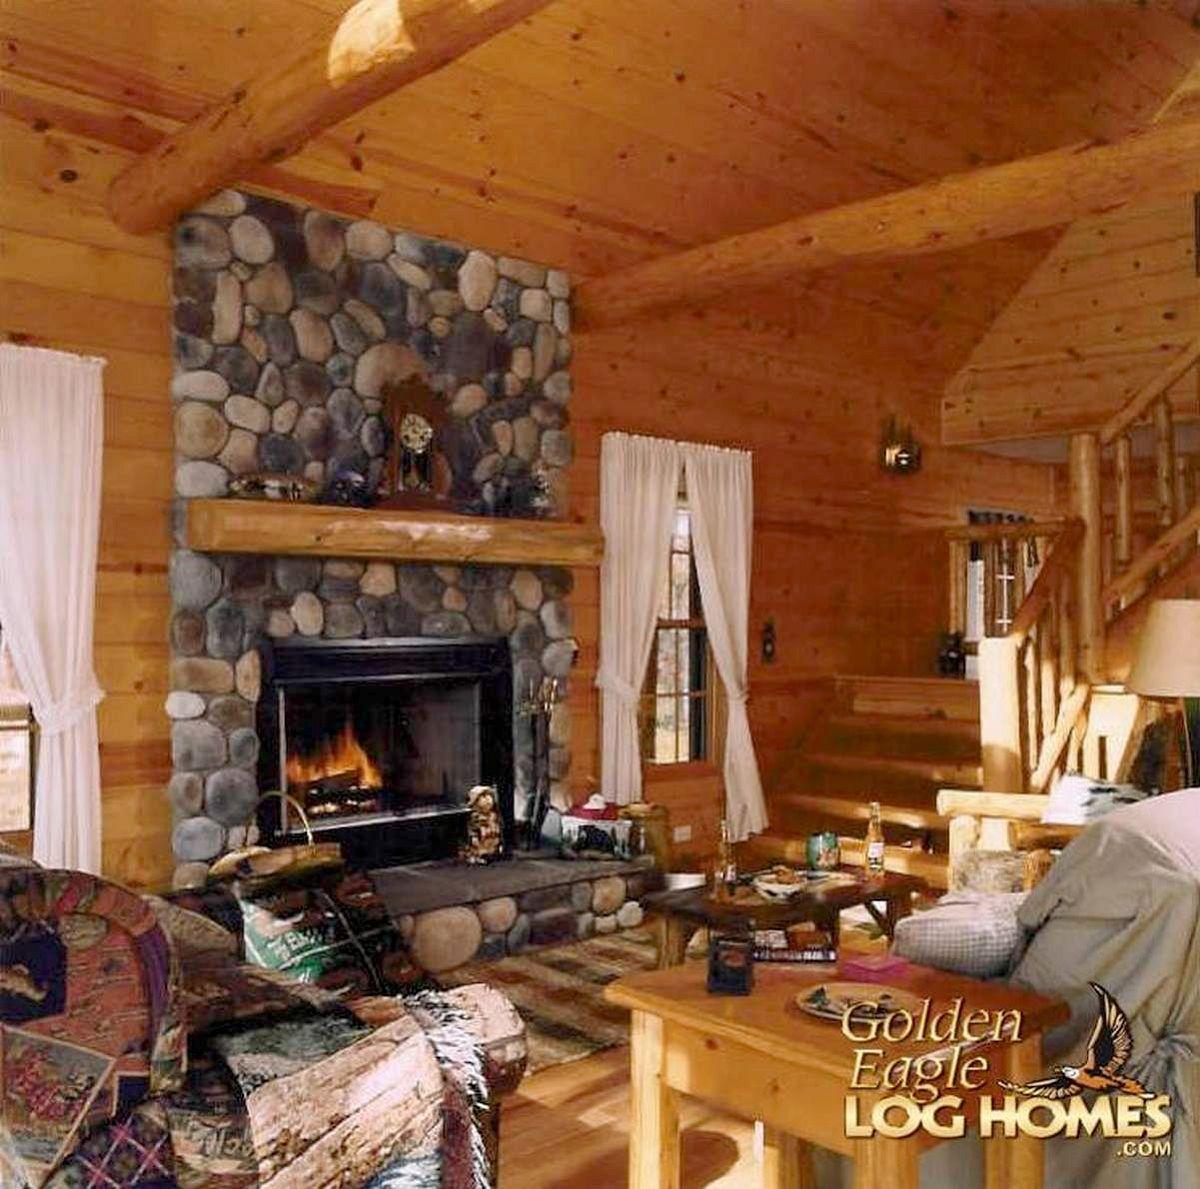 Log home interior ideas great room view   home decor  pinterest  golden eagle logs